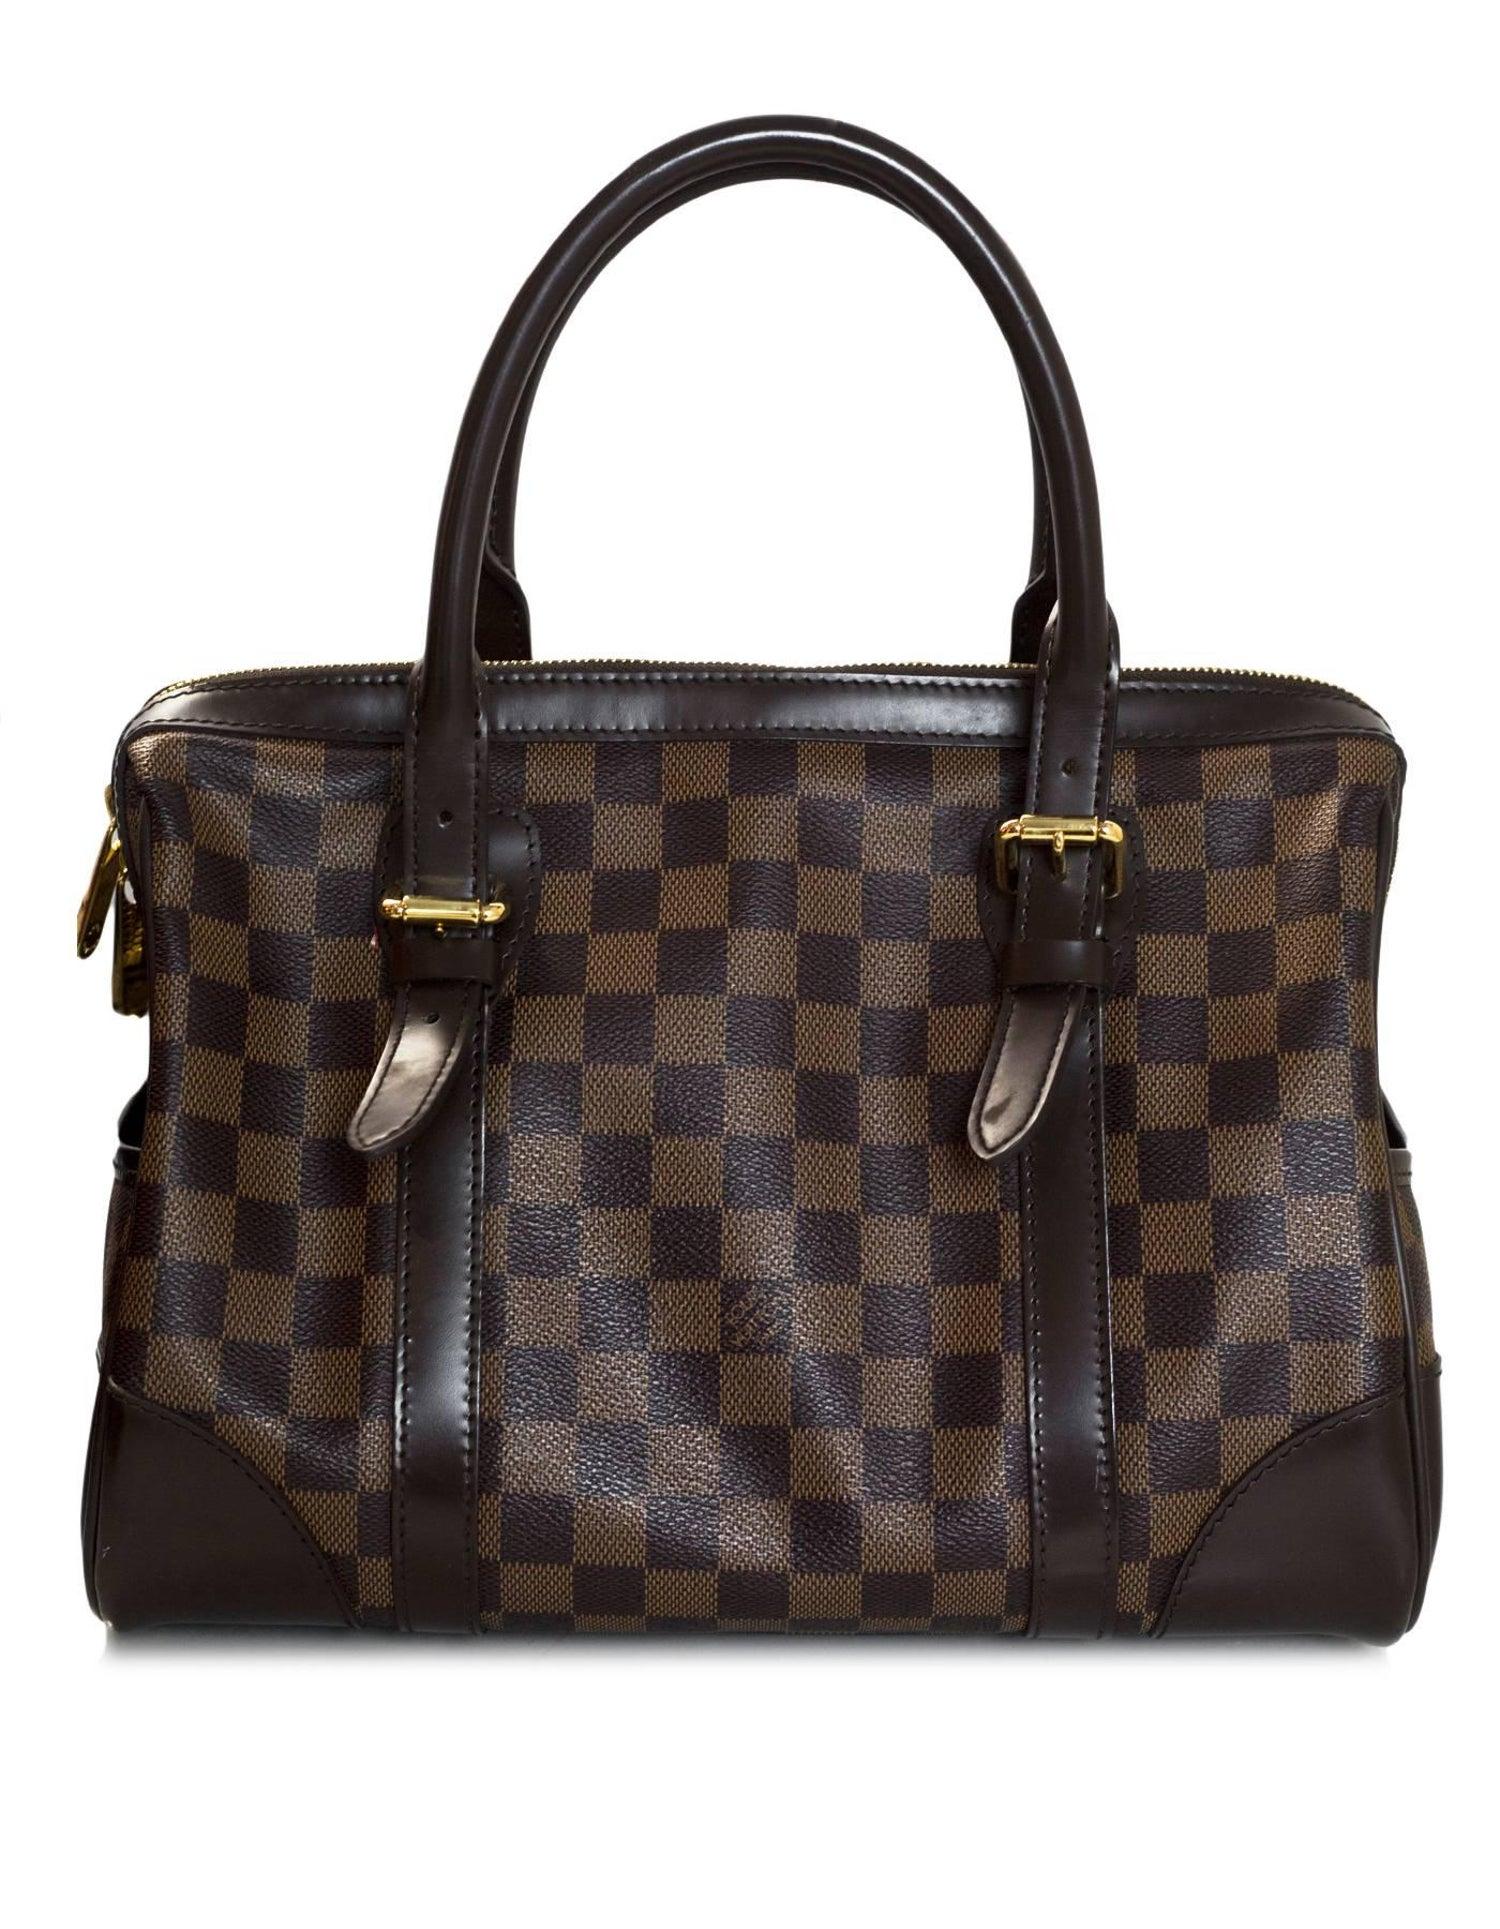 Louis Vuitton Damier Canvas Berkeley Bag with Dust Bag For Sale at 1stdibs 66a1edb10d83a